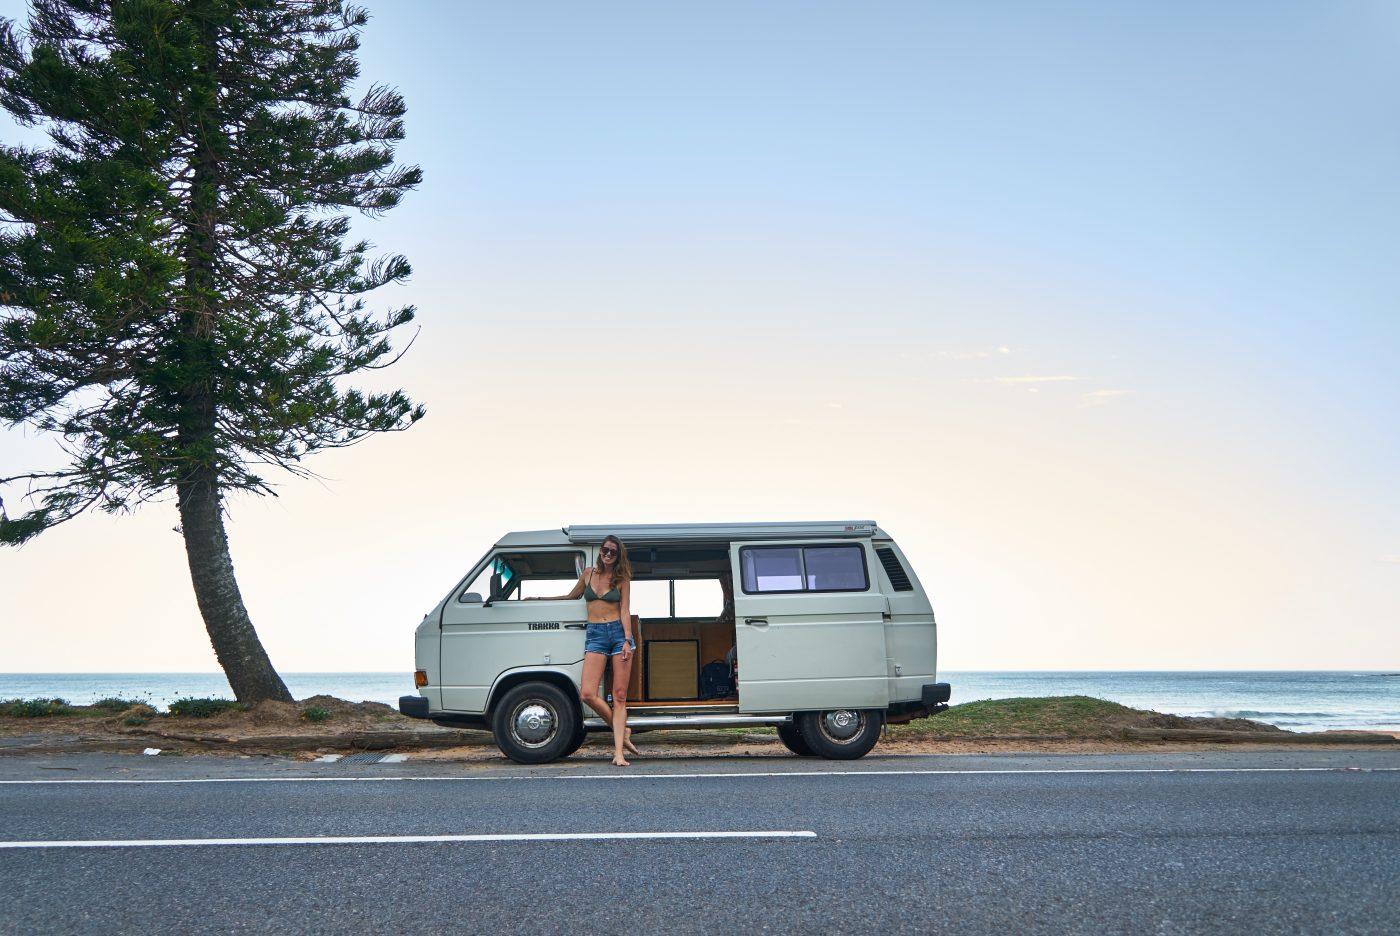 Saving Money for Travel: Mobile Home